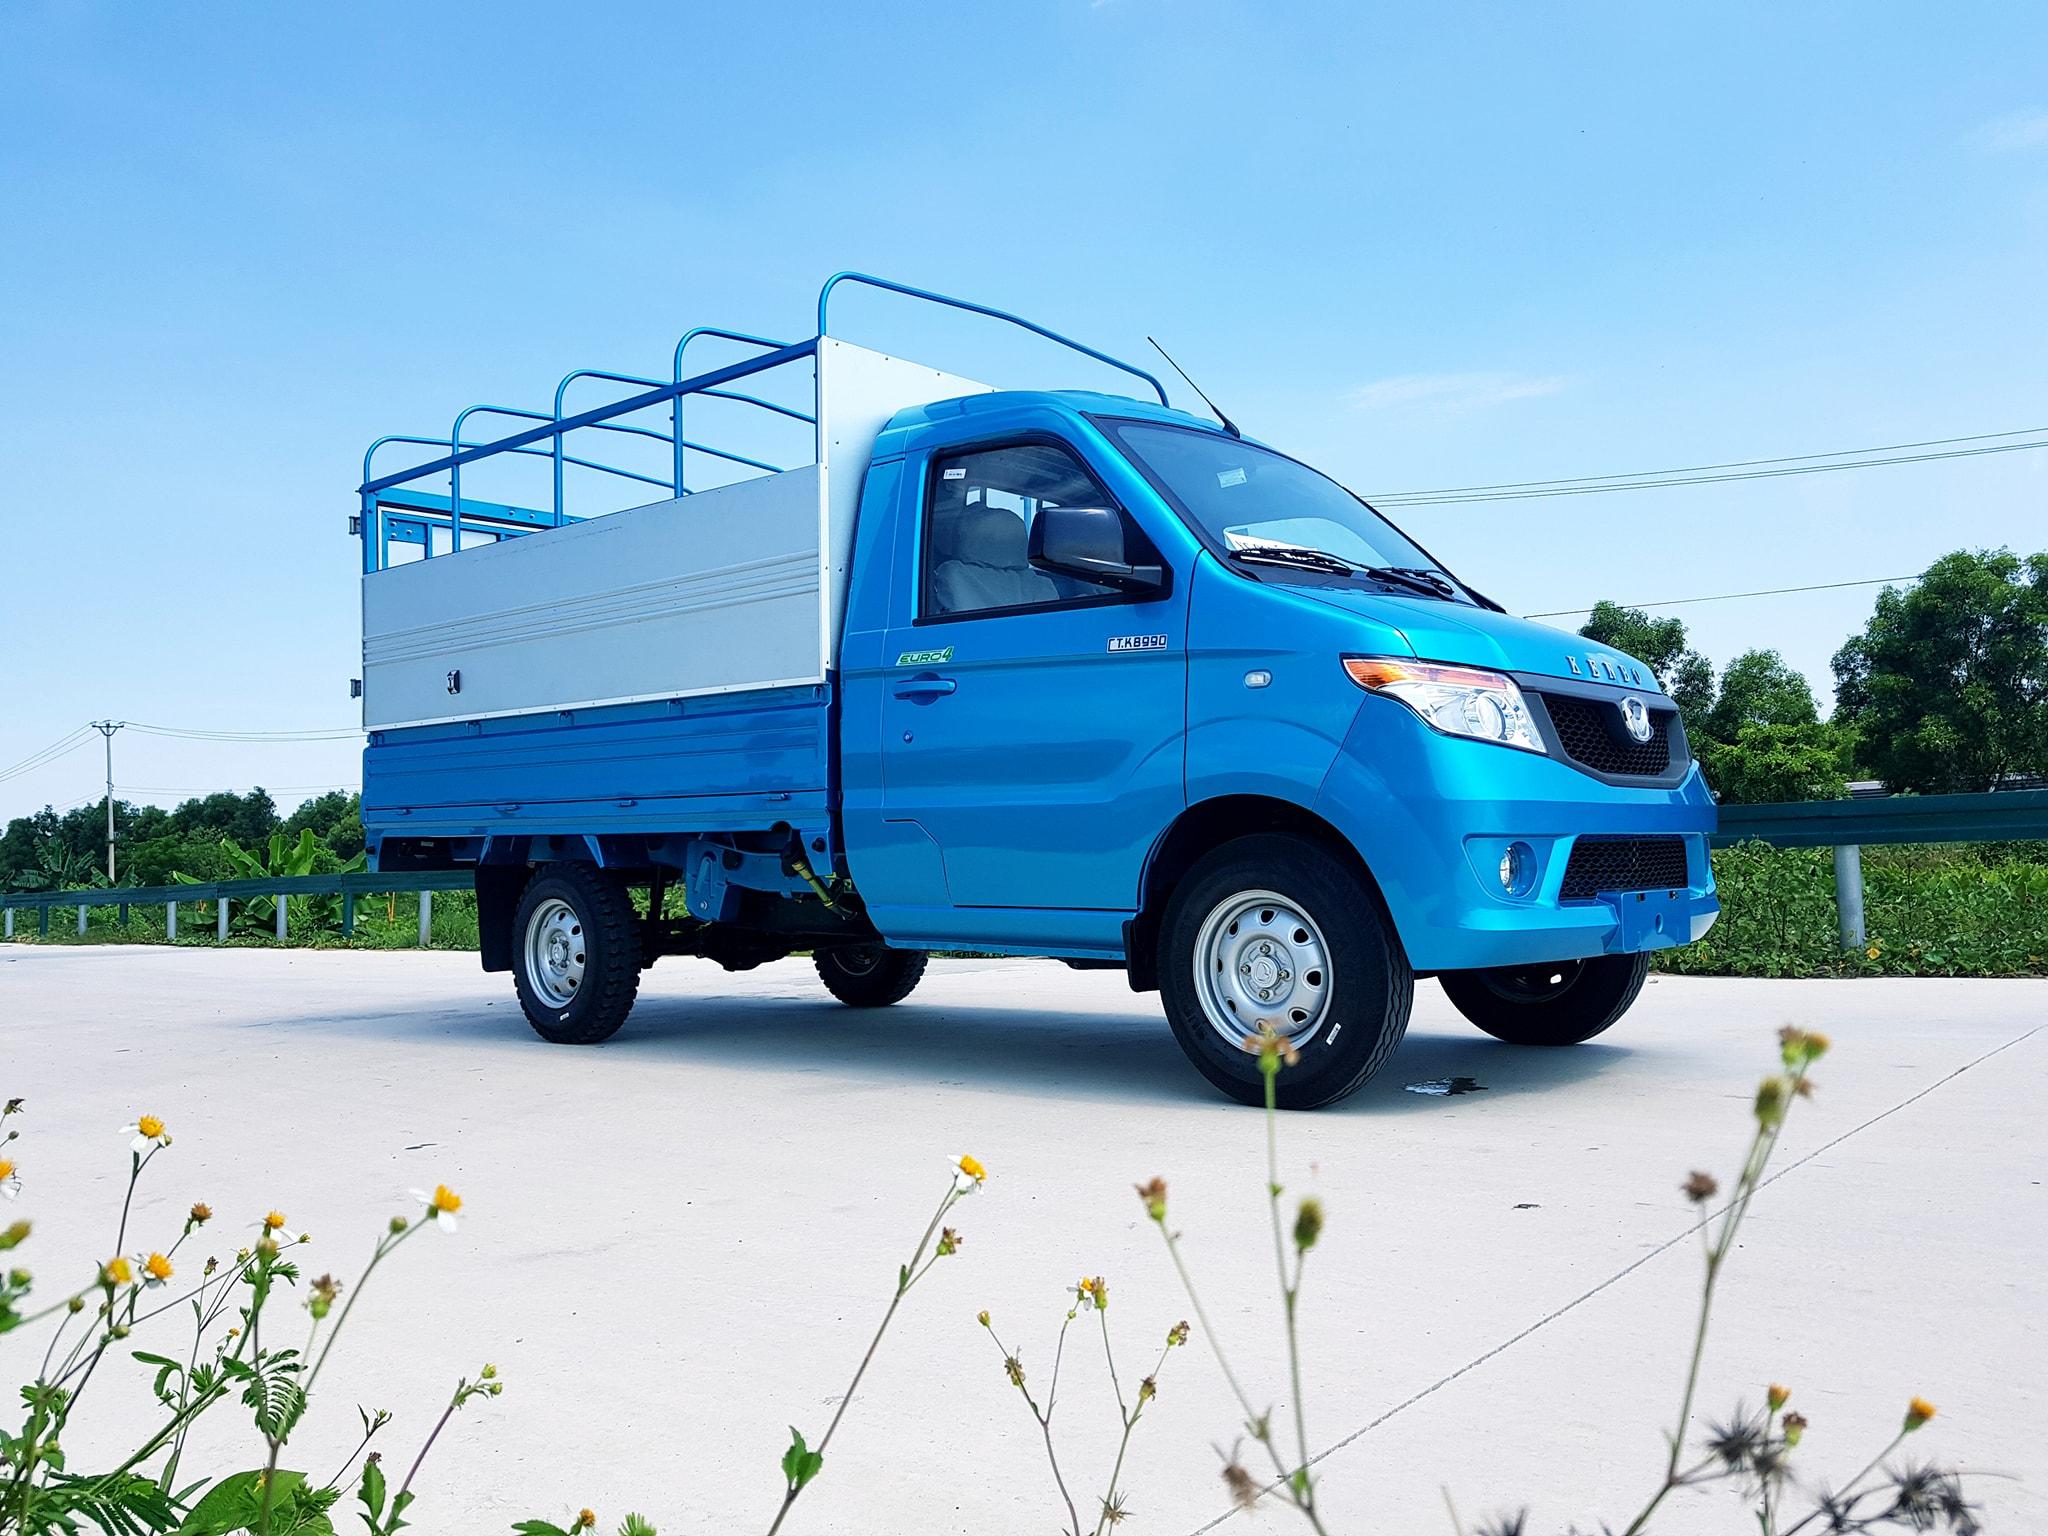 kenbo-khung-mui-990kg-2020